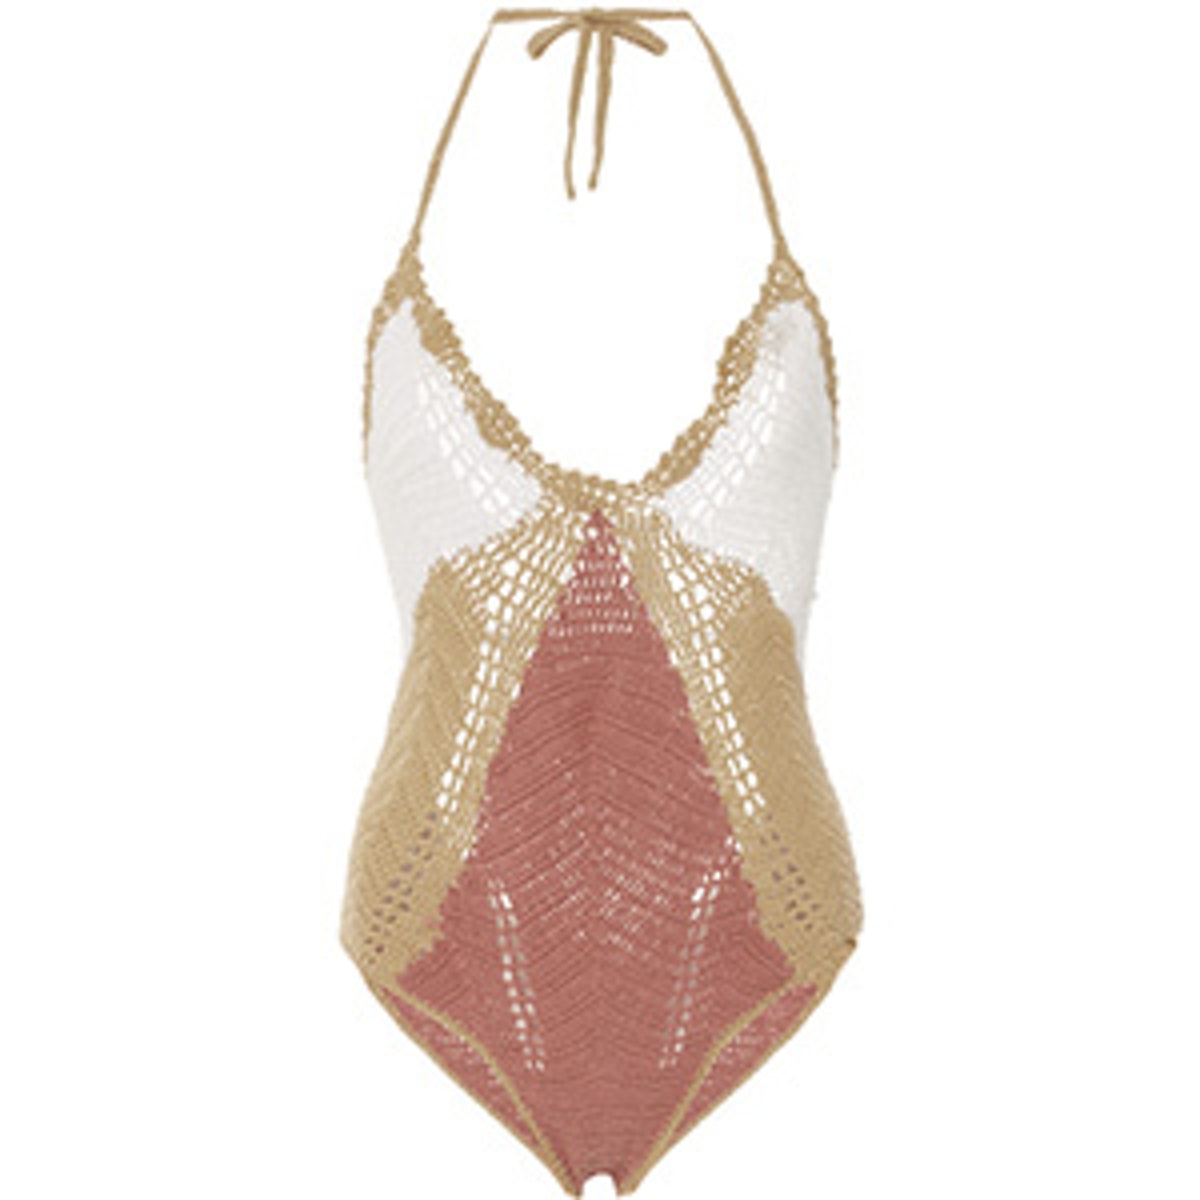 Baez Crochet Swimsuit